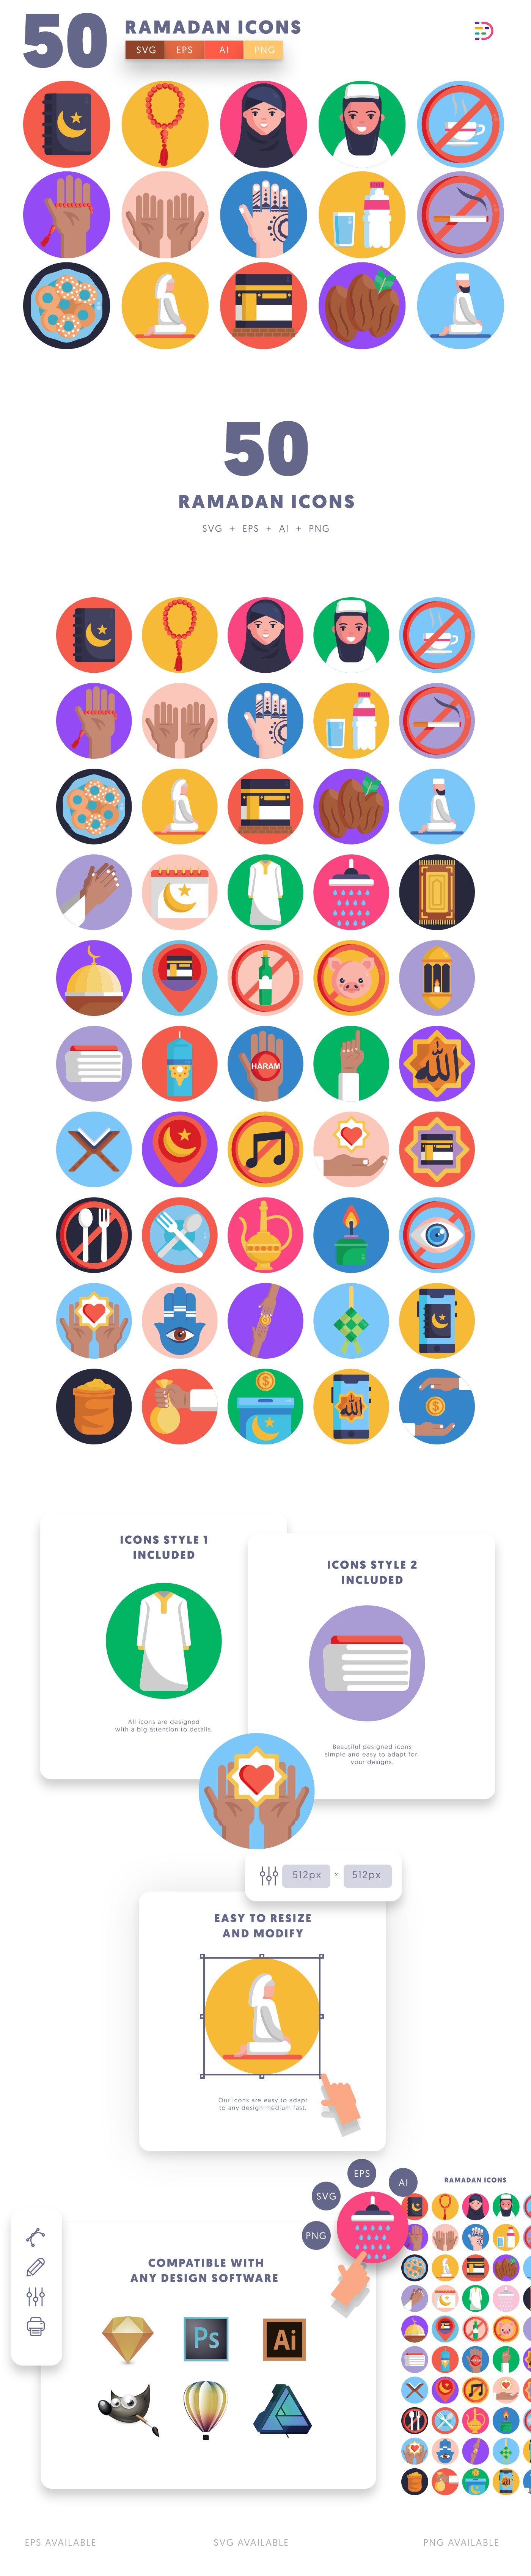 Ramadan icons info graphic